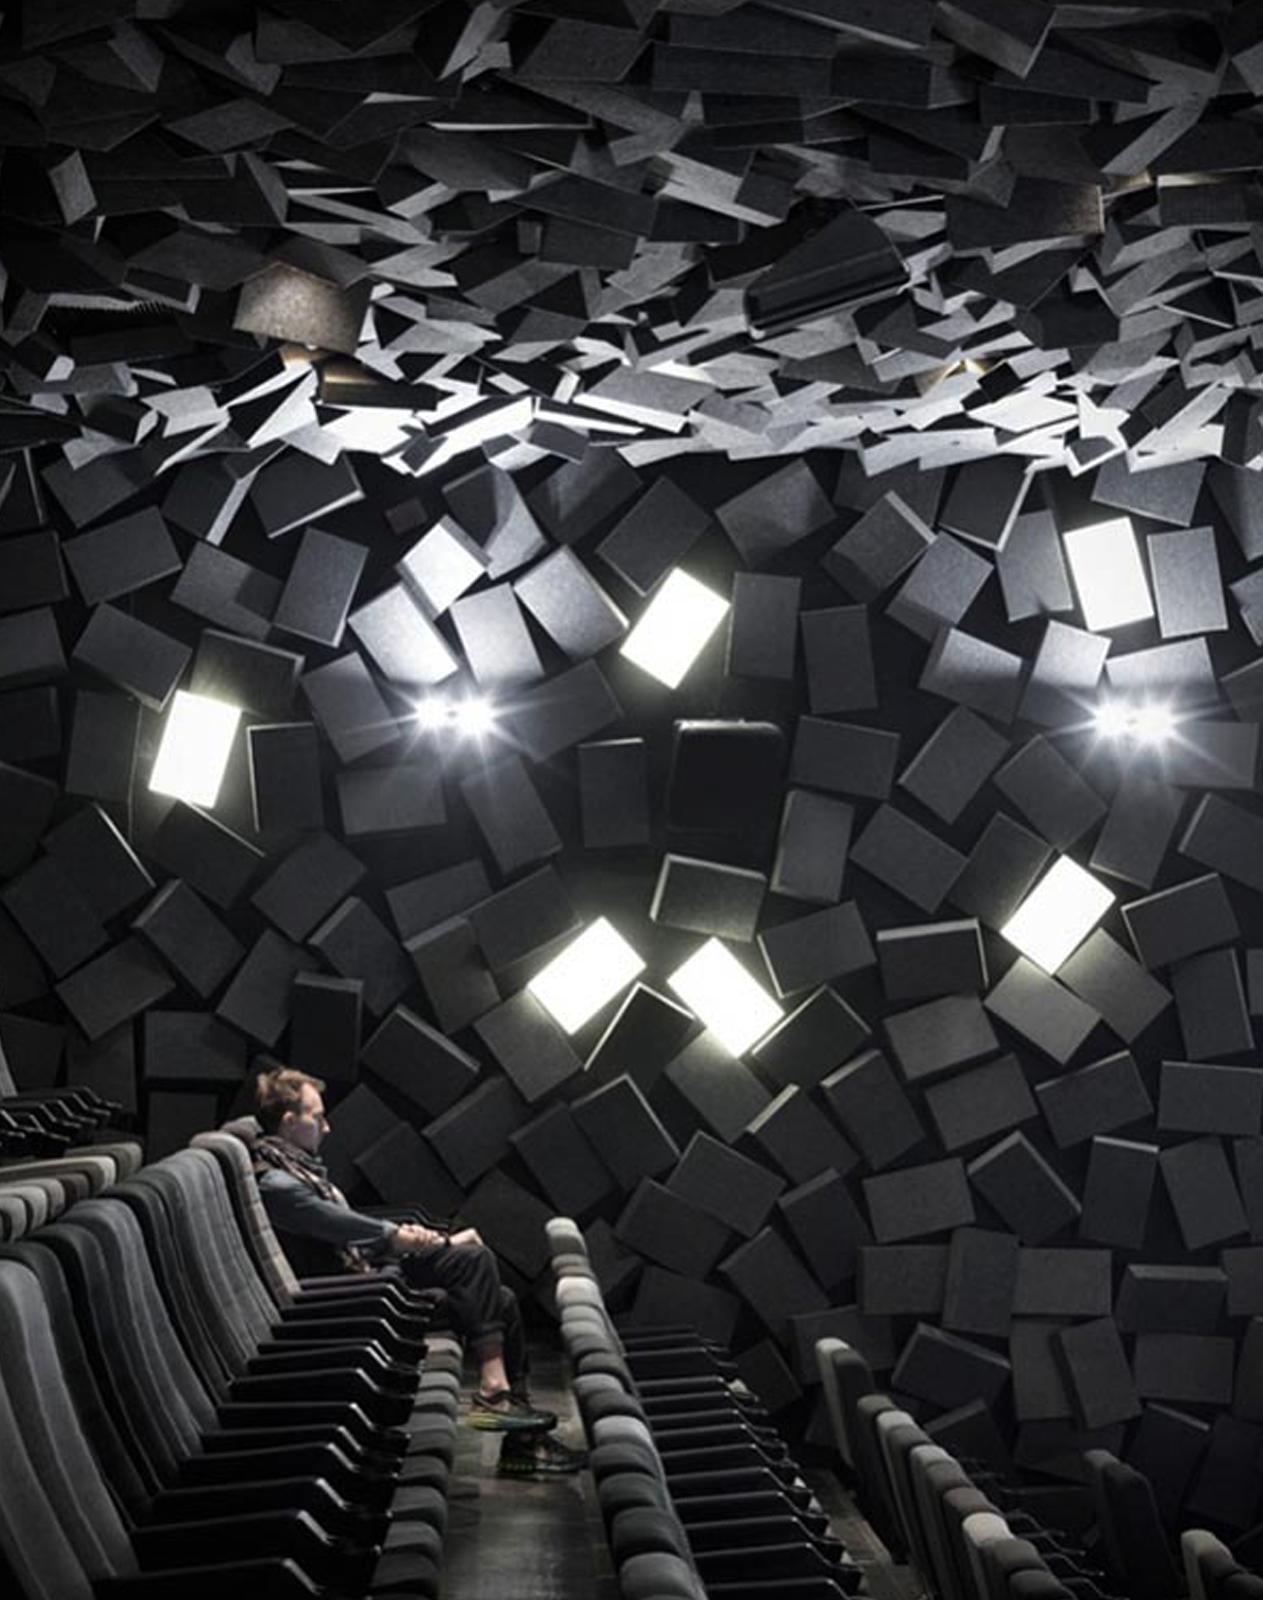 cine-explode-cinema-3d-elmejorcine-delmundo-4